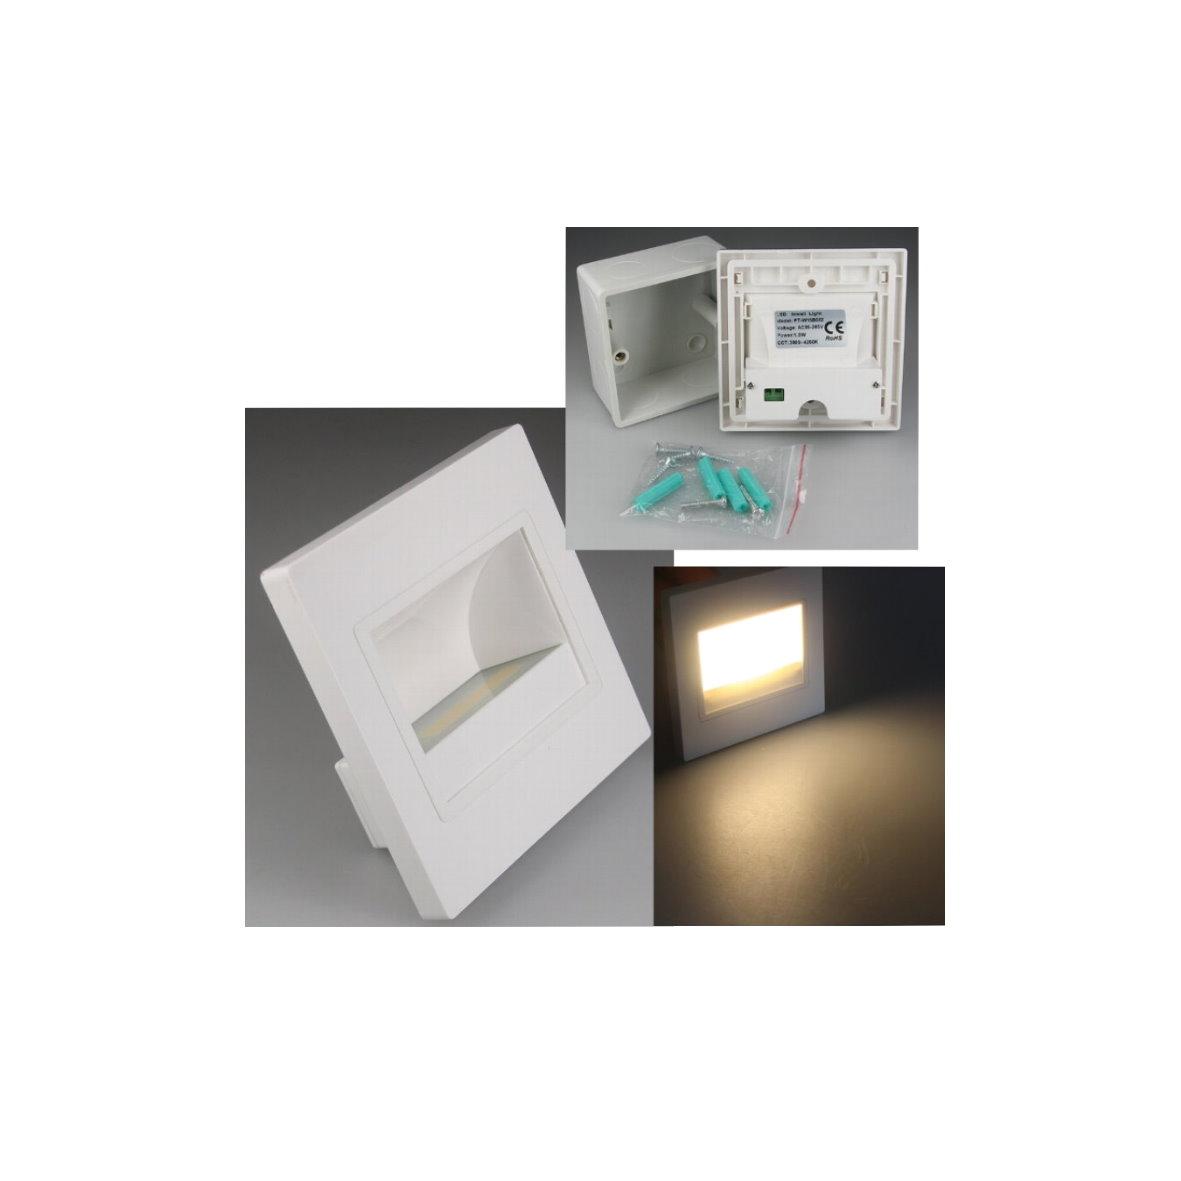 led beleuchtung treppenhaus yarial indirekte beleuchtung. Black Bedroom Furniture Sets. Home Design Ideas